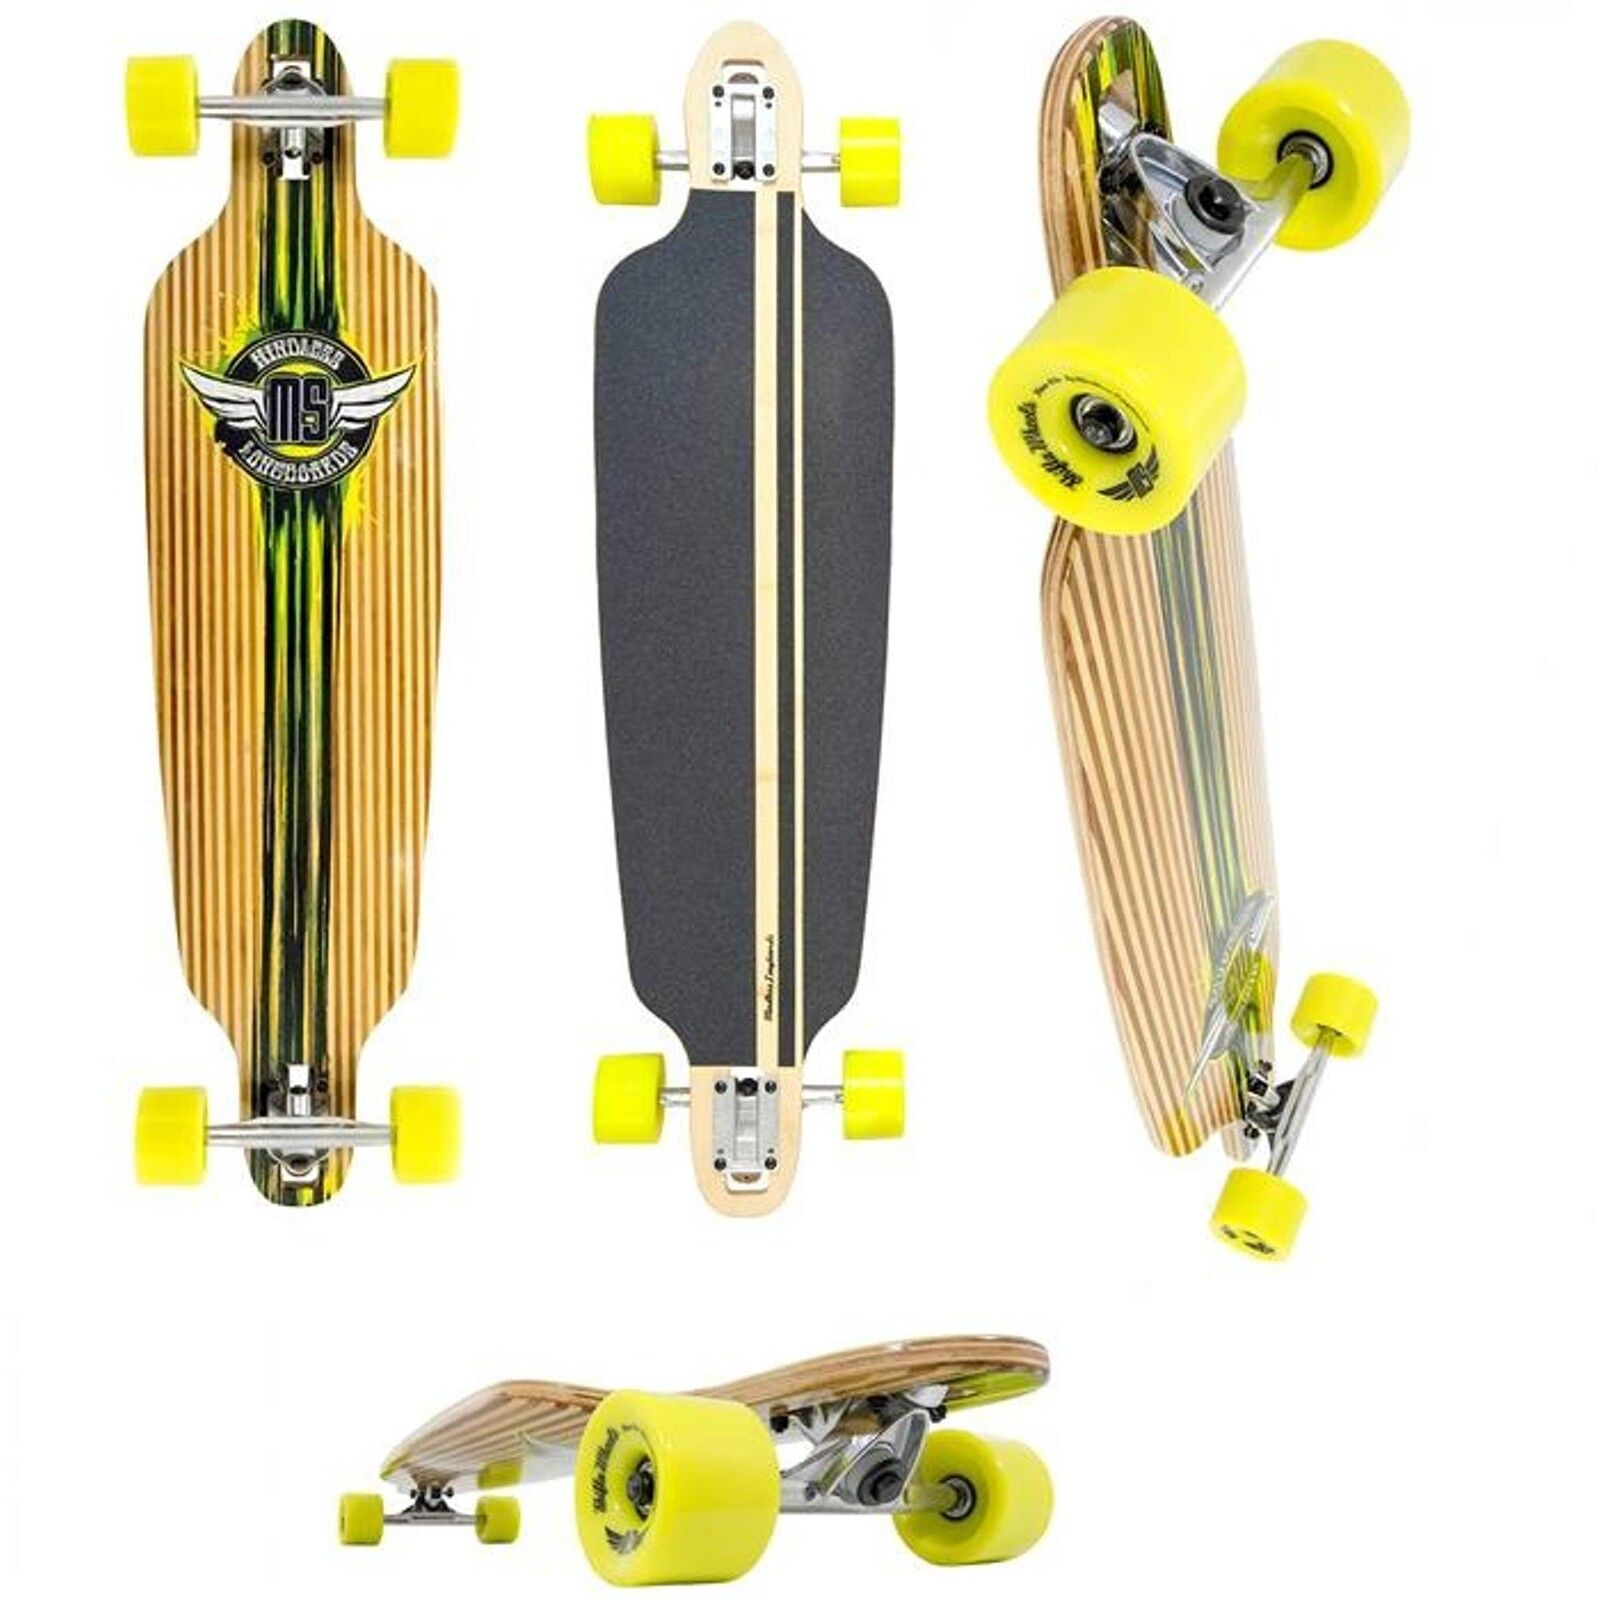 Longboard Area Ram DTS Aloha Mindless Osprey DTS Ram  Skateboard 1653ef